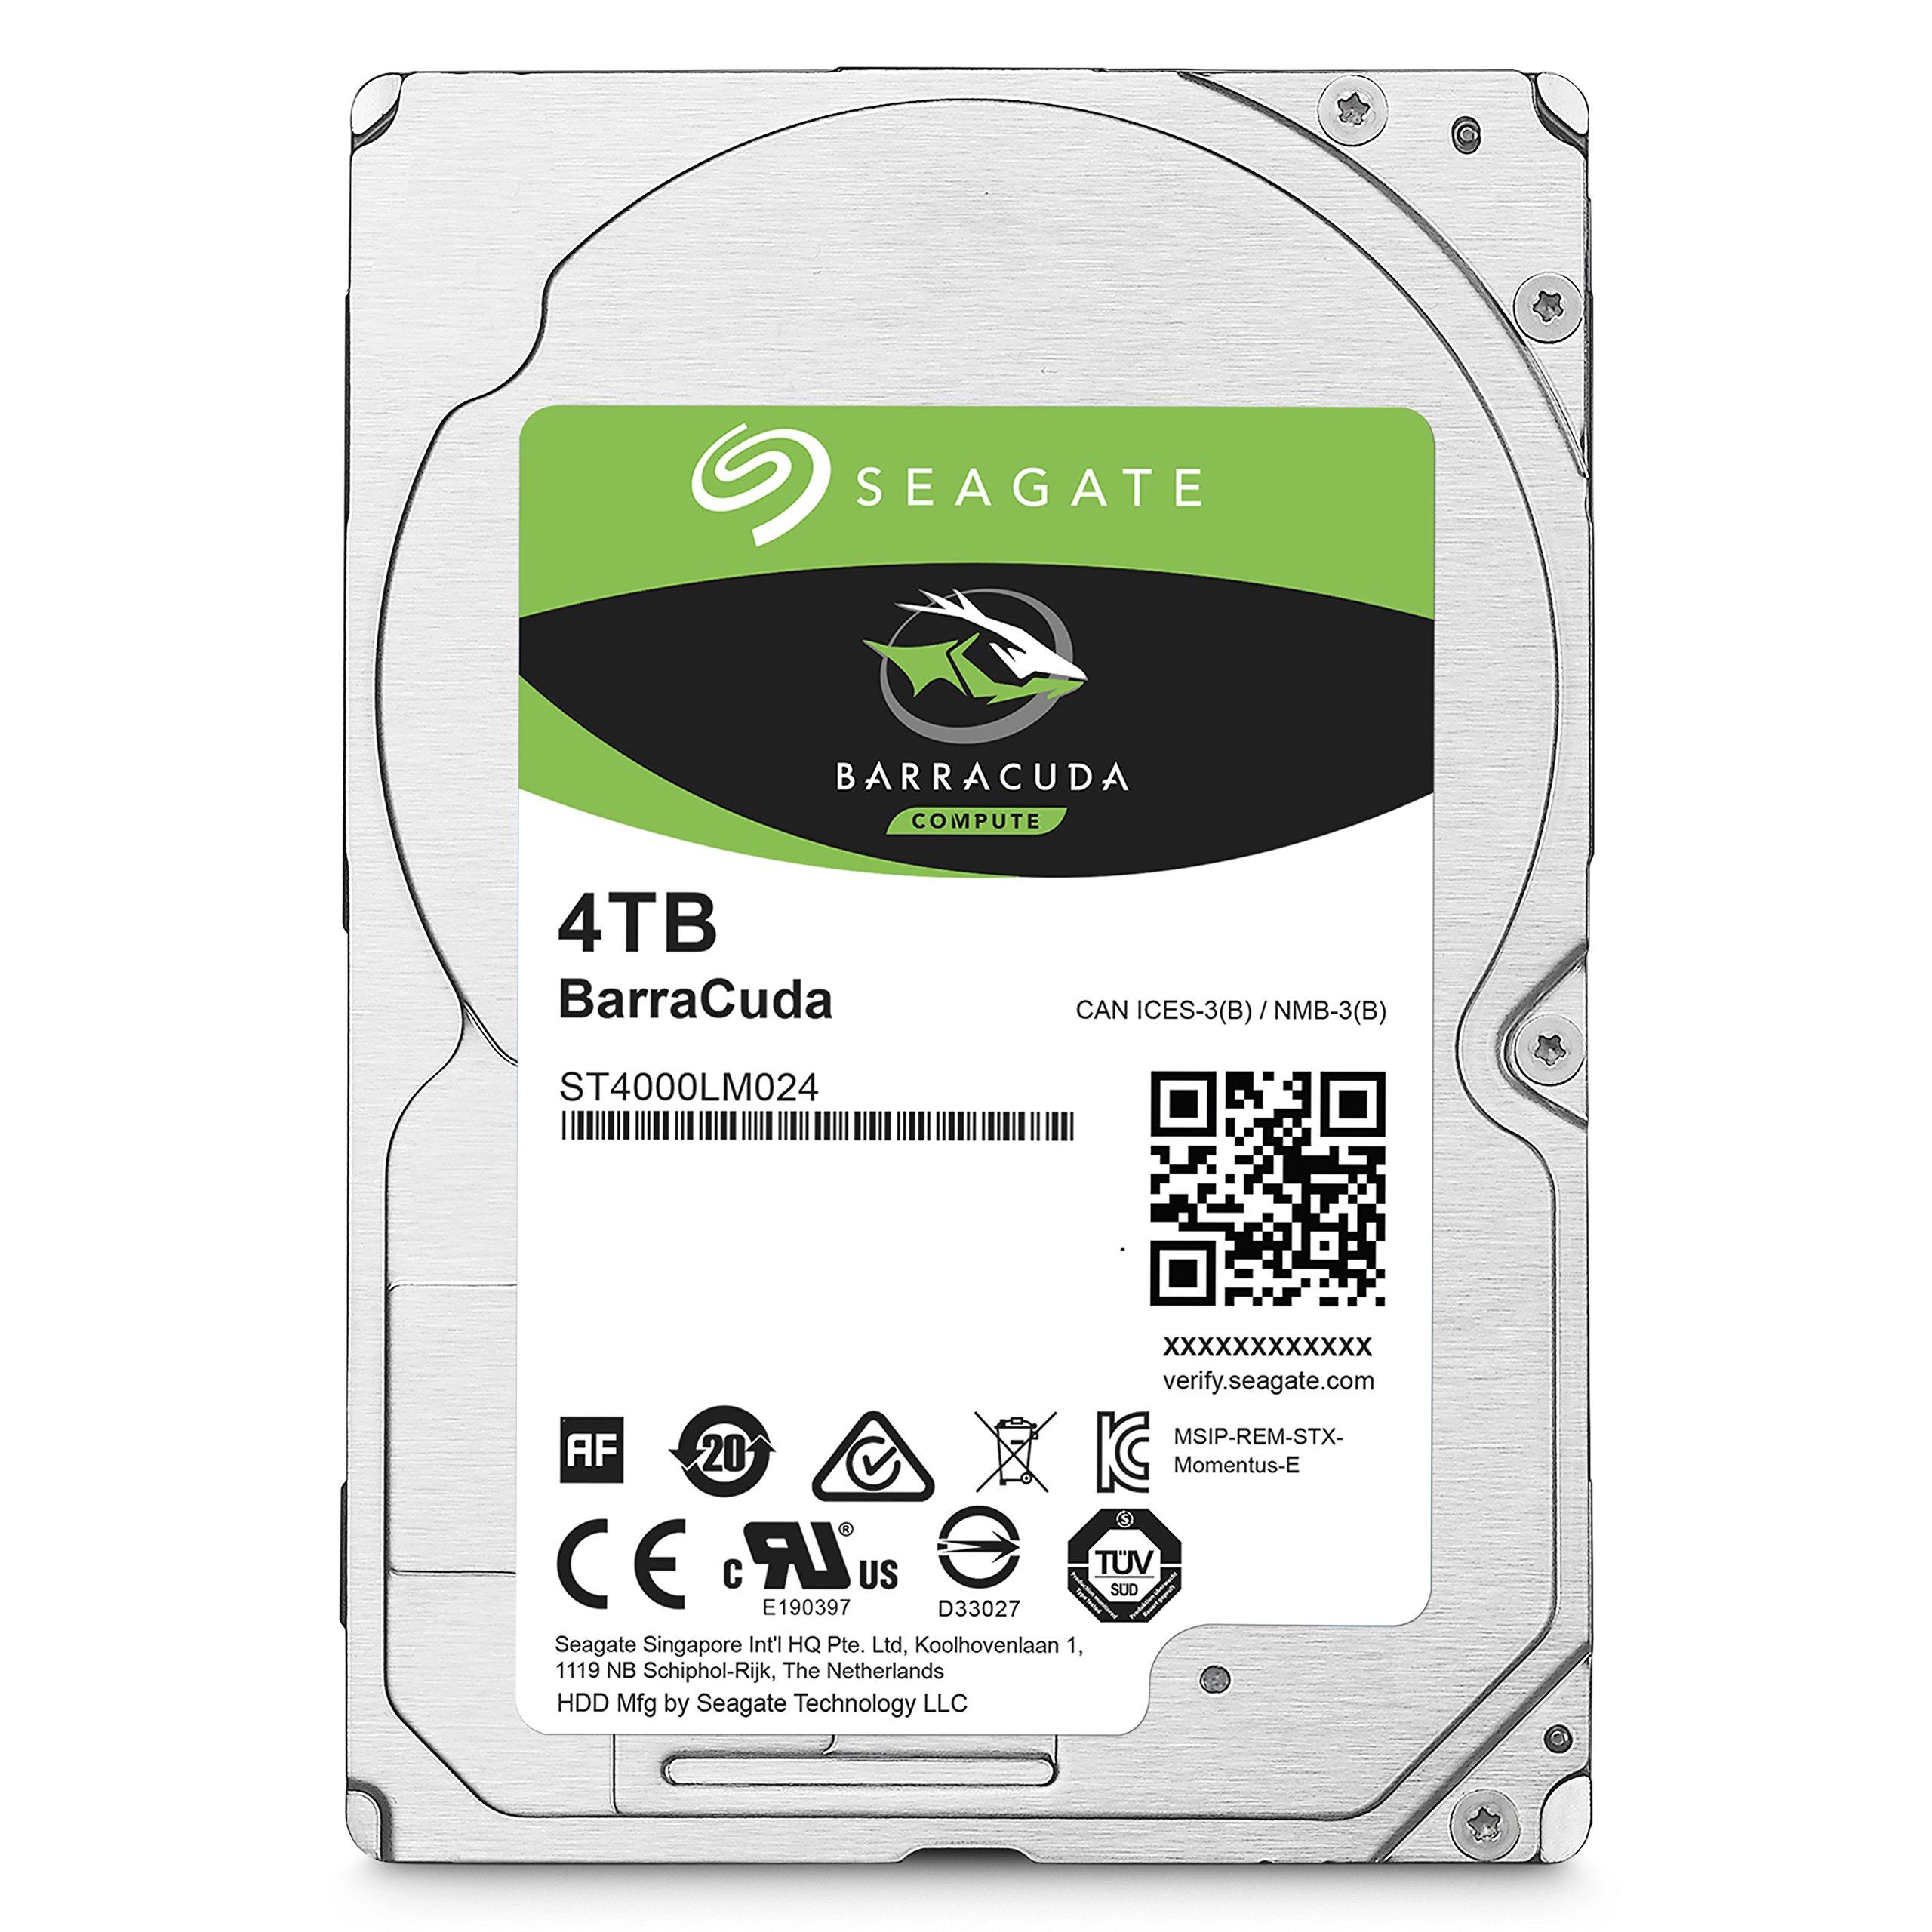 Seagate BarraCuda Mobile Hard Drive 4TB SATA 6Gb/s 128MB Cache 2.5-Inch 15mm (ST4000LM024) by Seagate